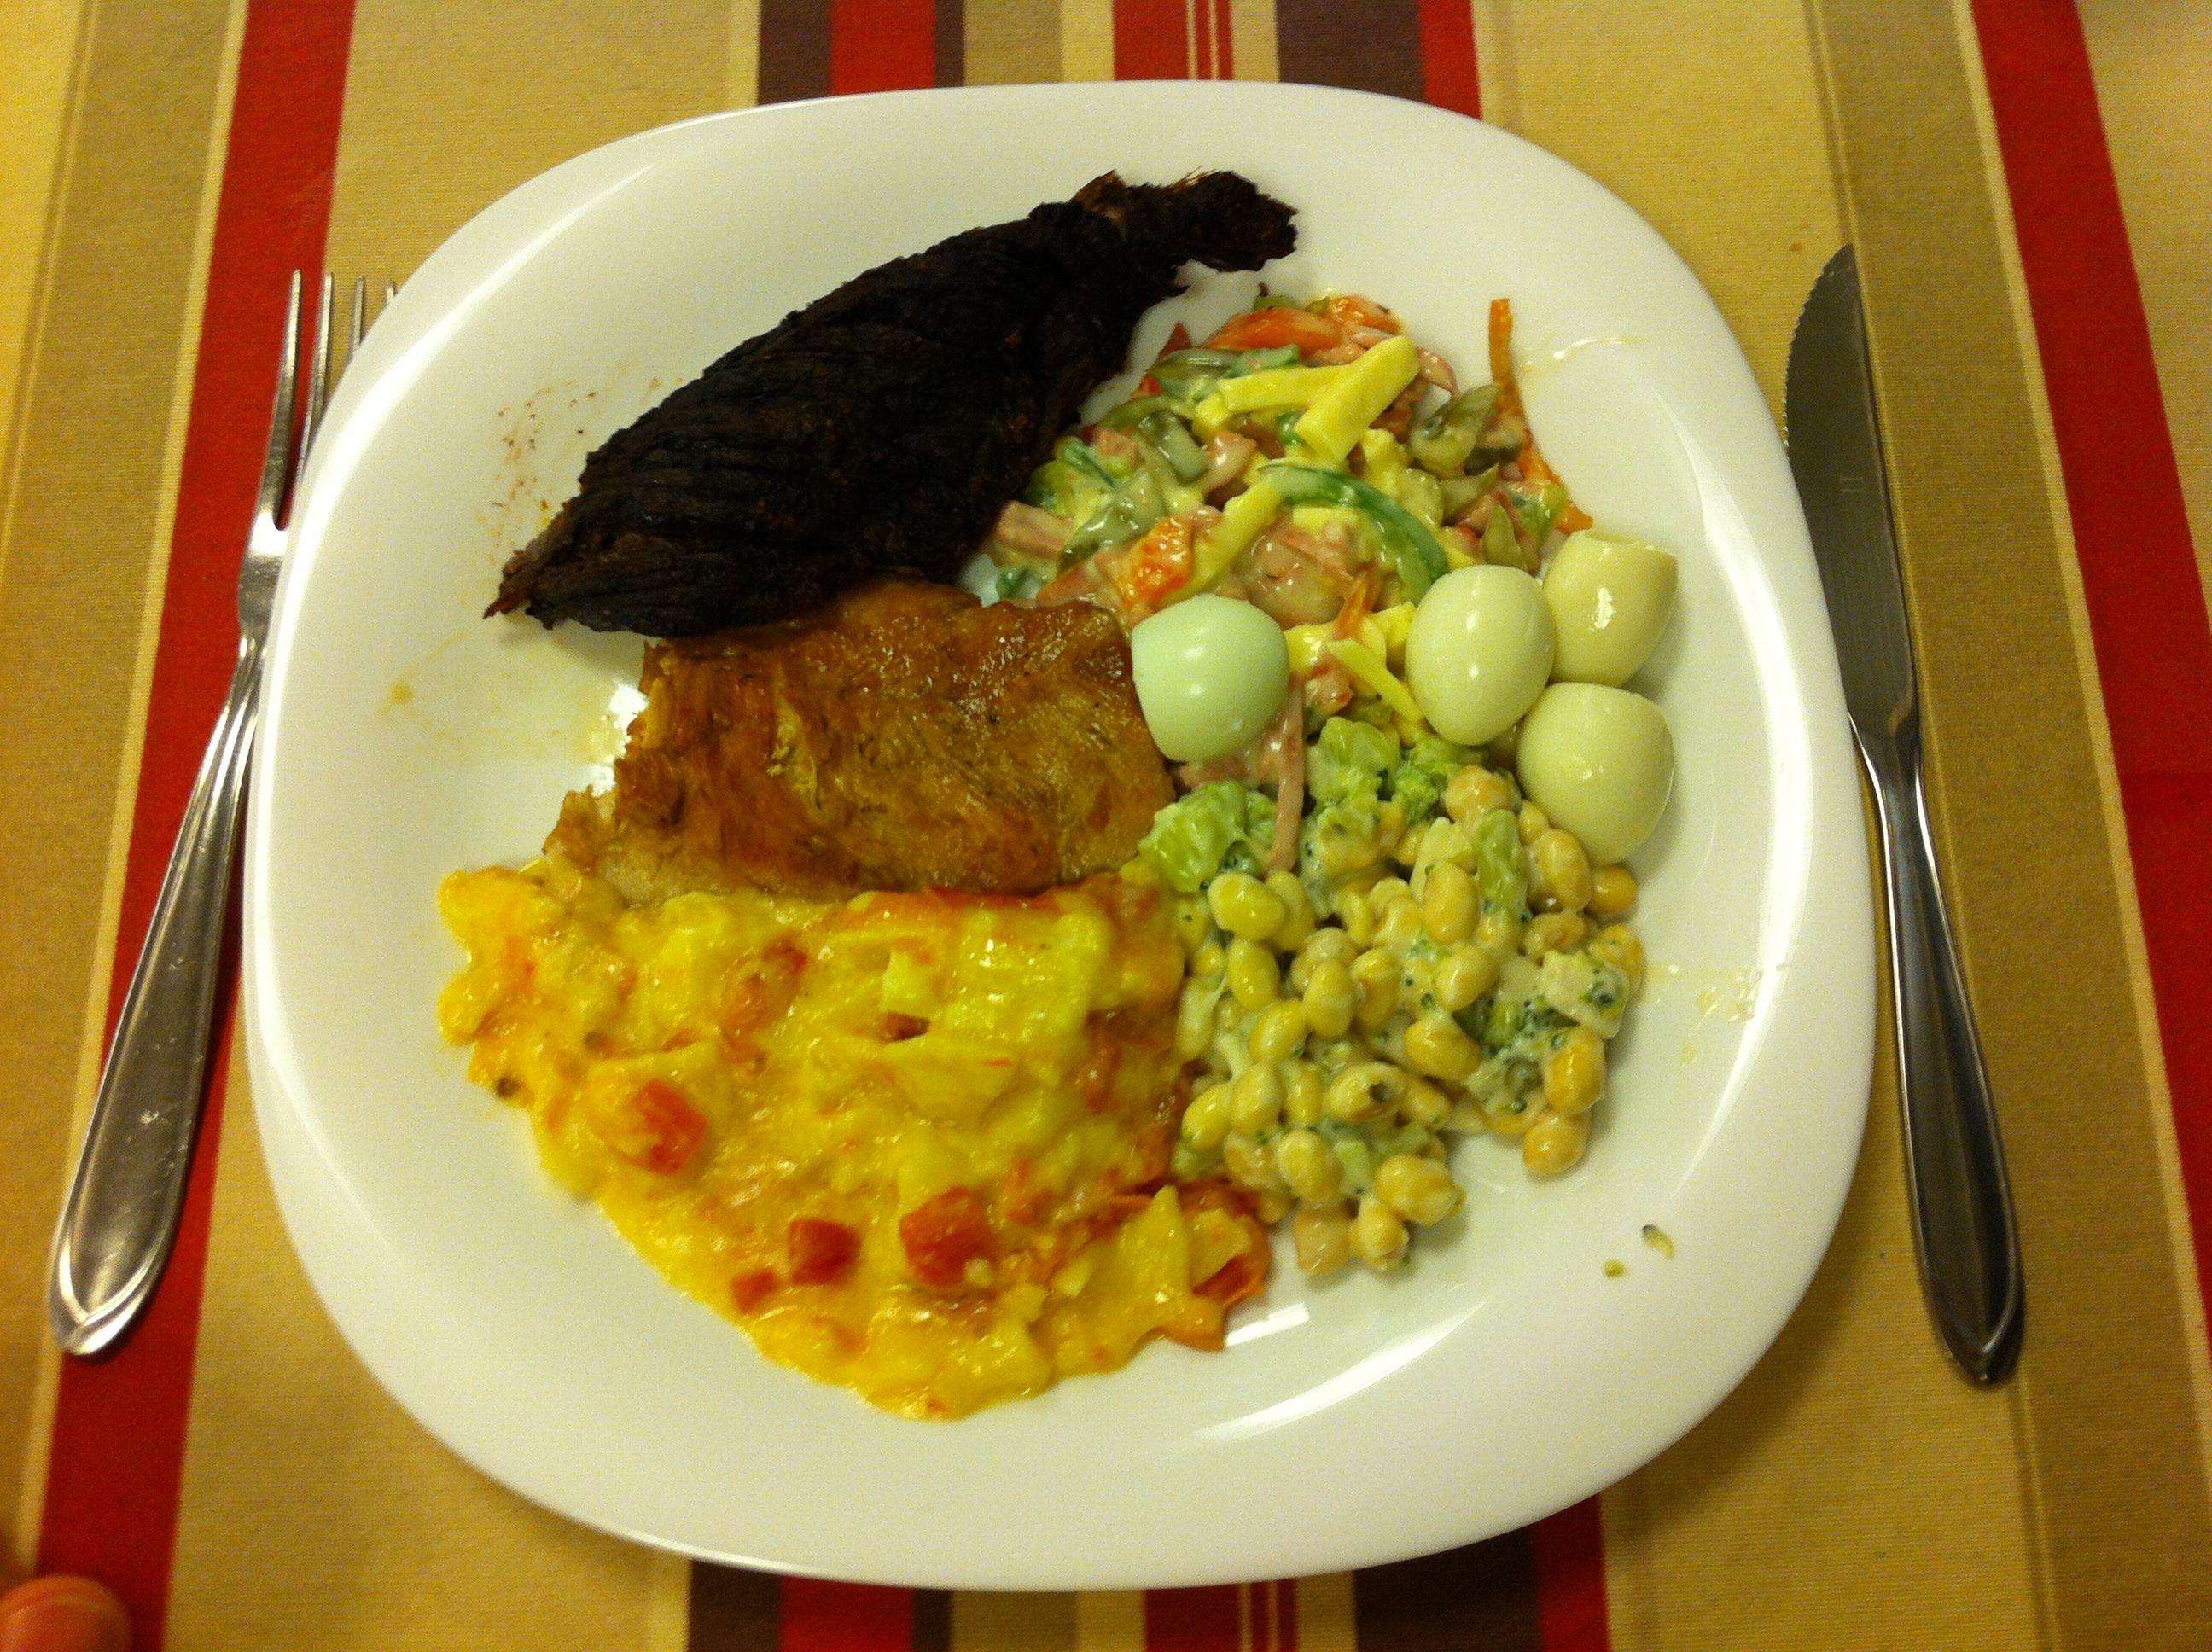 Almoço .LT 17/09/2012 Restaurante Firenze - Farroupilha/RS/Brasil (foto by @Luis Tamiosso (luccks))